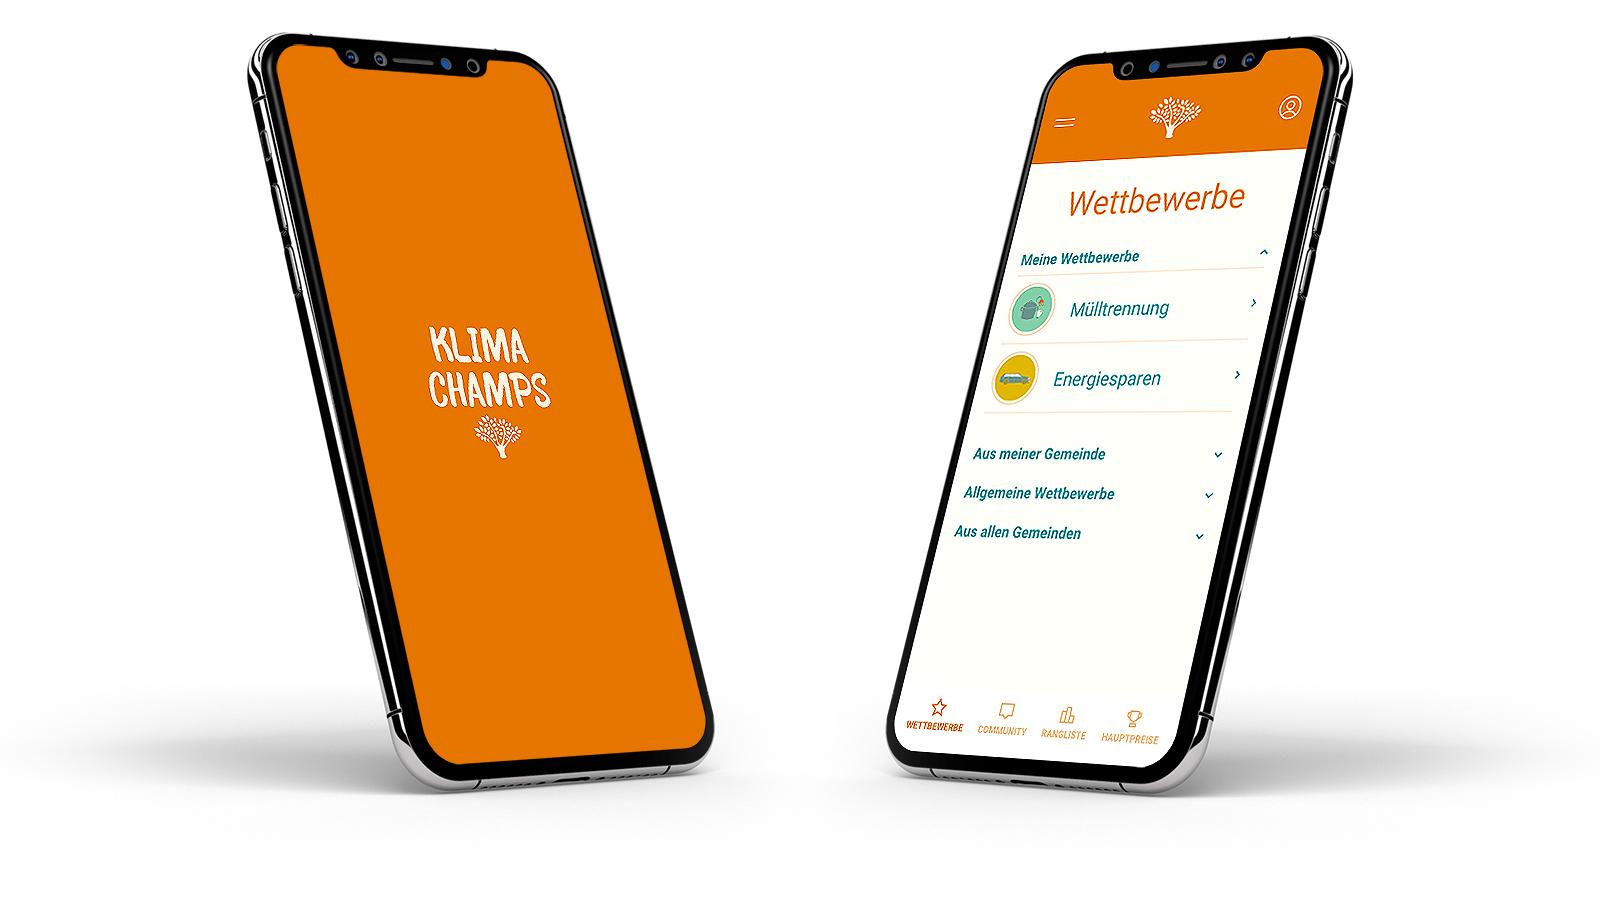 Mockup der Conversory Klima Champs App am Handy